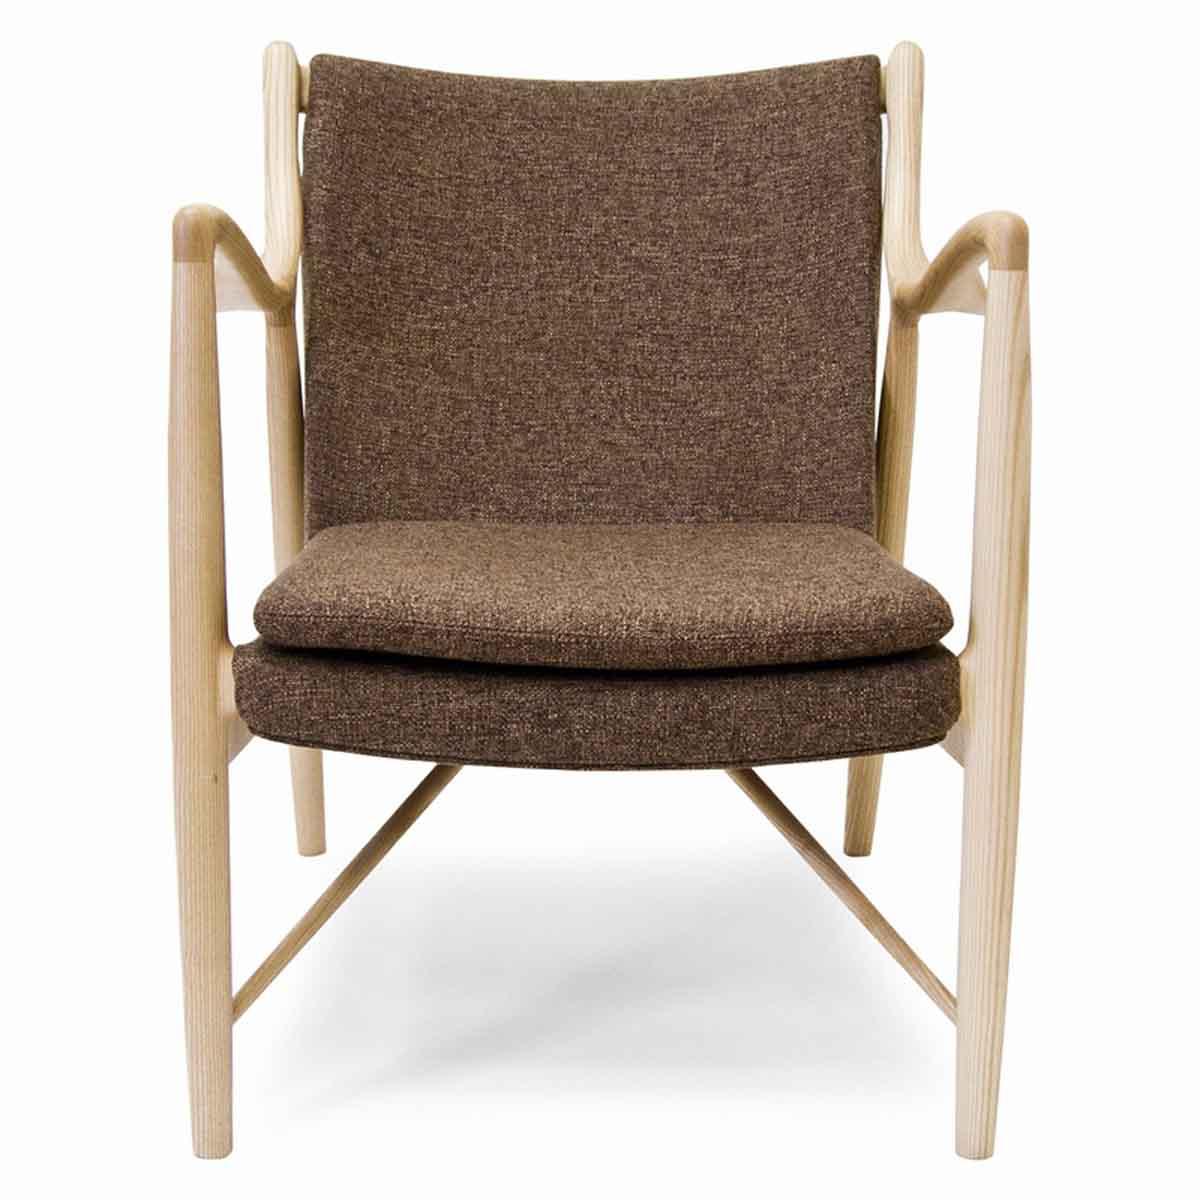 Peachy Finn Juhl 45 Chair Andrewgaddart Wooden Chair Designs For Living Room Andrewgaddartcom